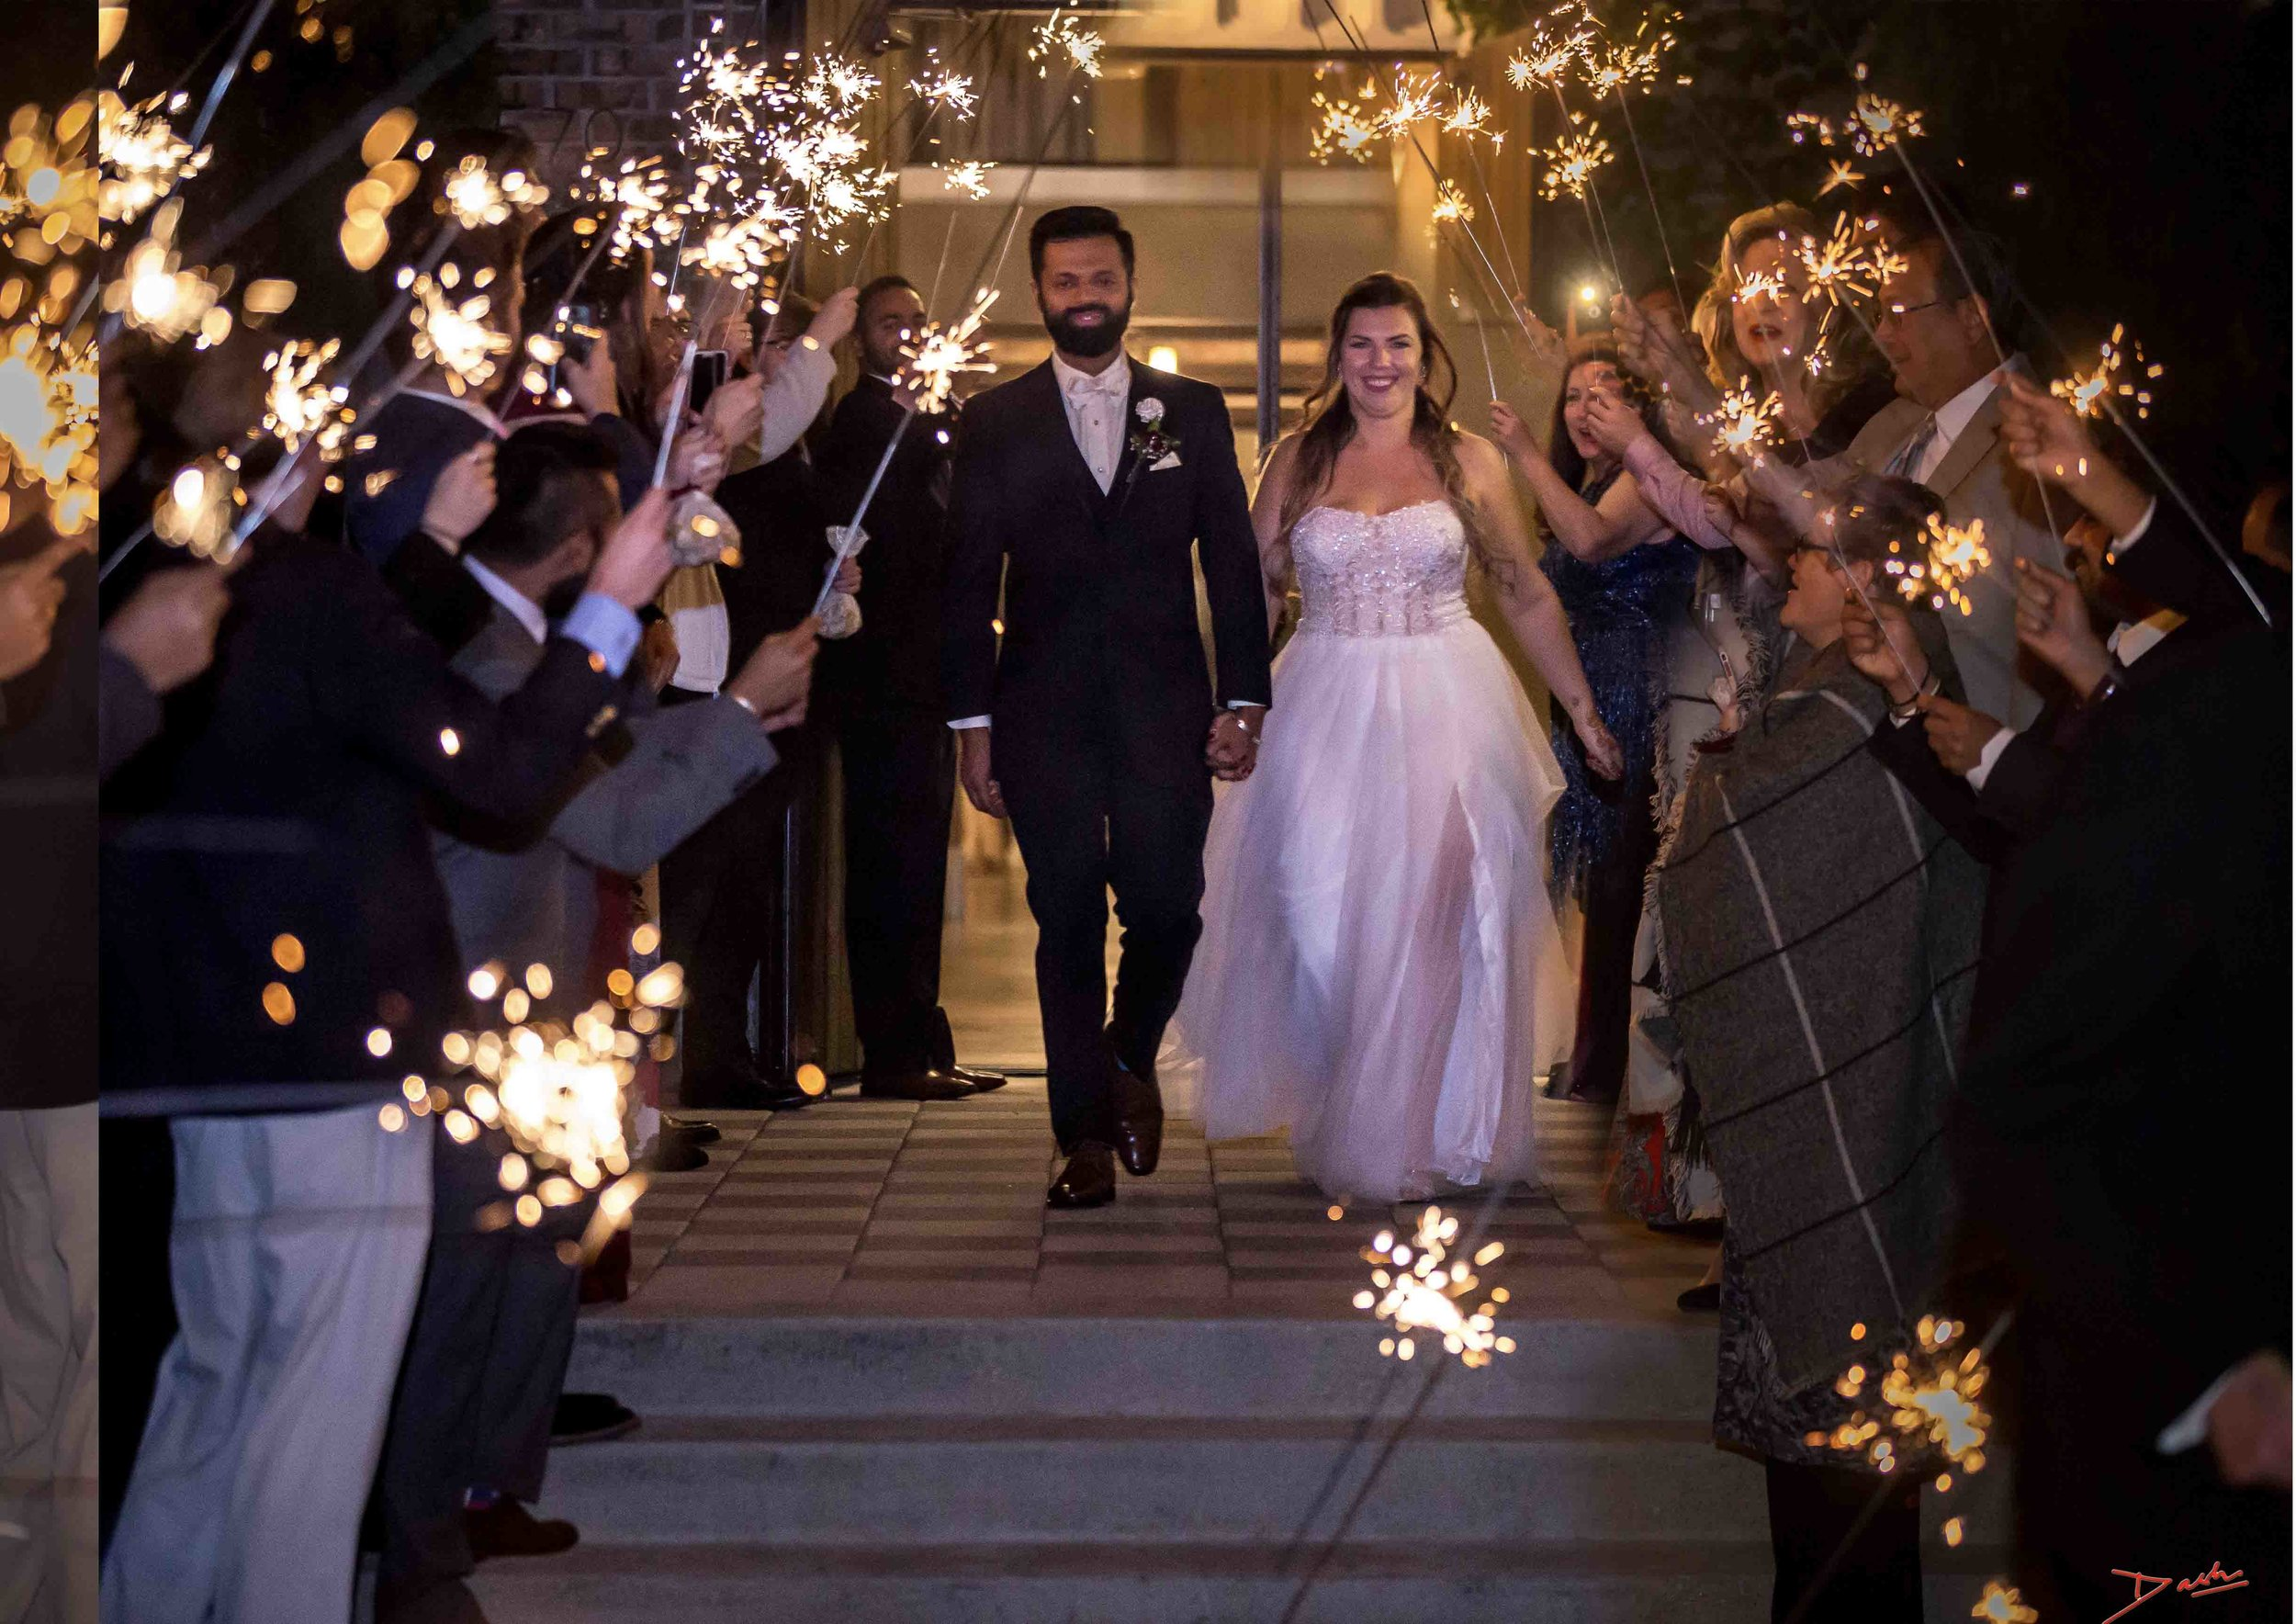 Aristide Sparkle Exit Wedding Photographer in Memphis Collierville TN.jpg